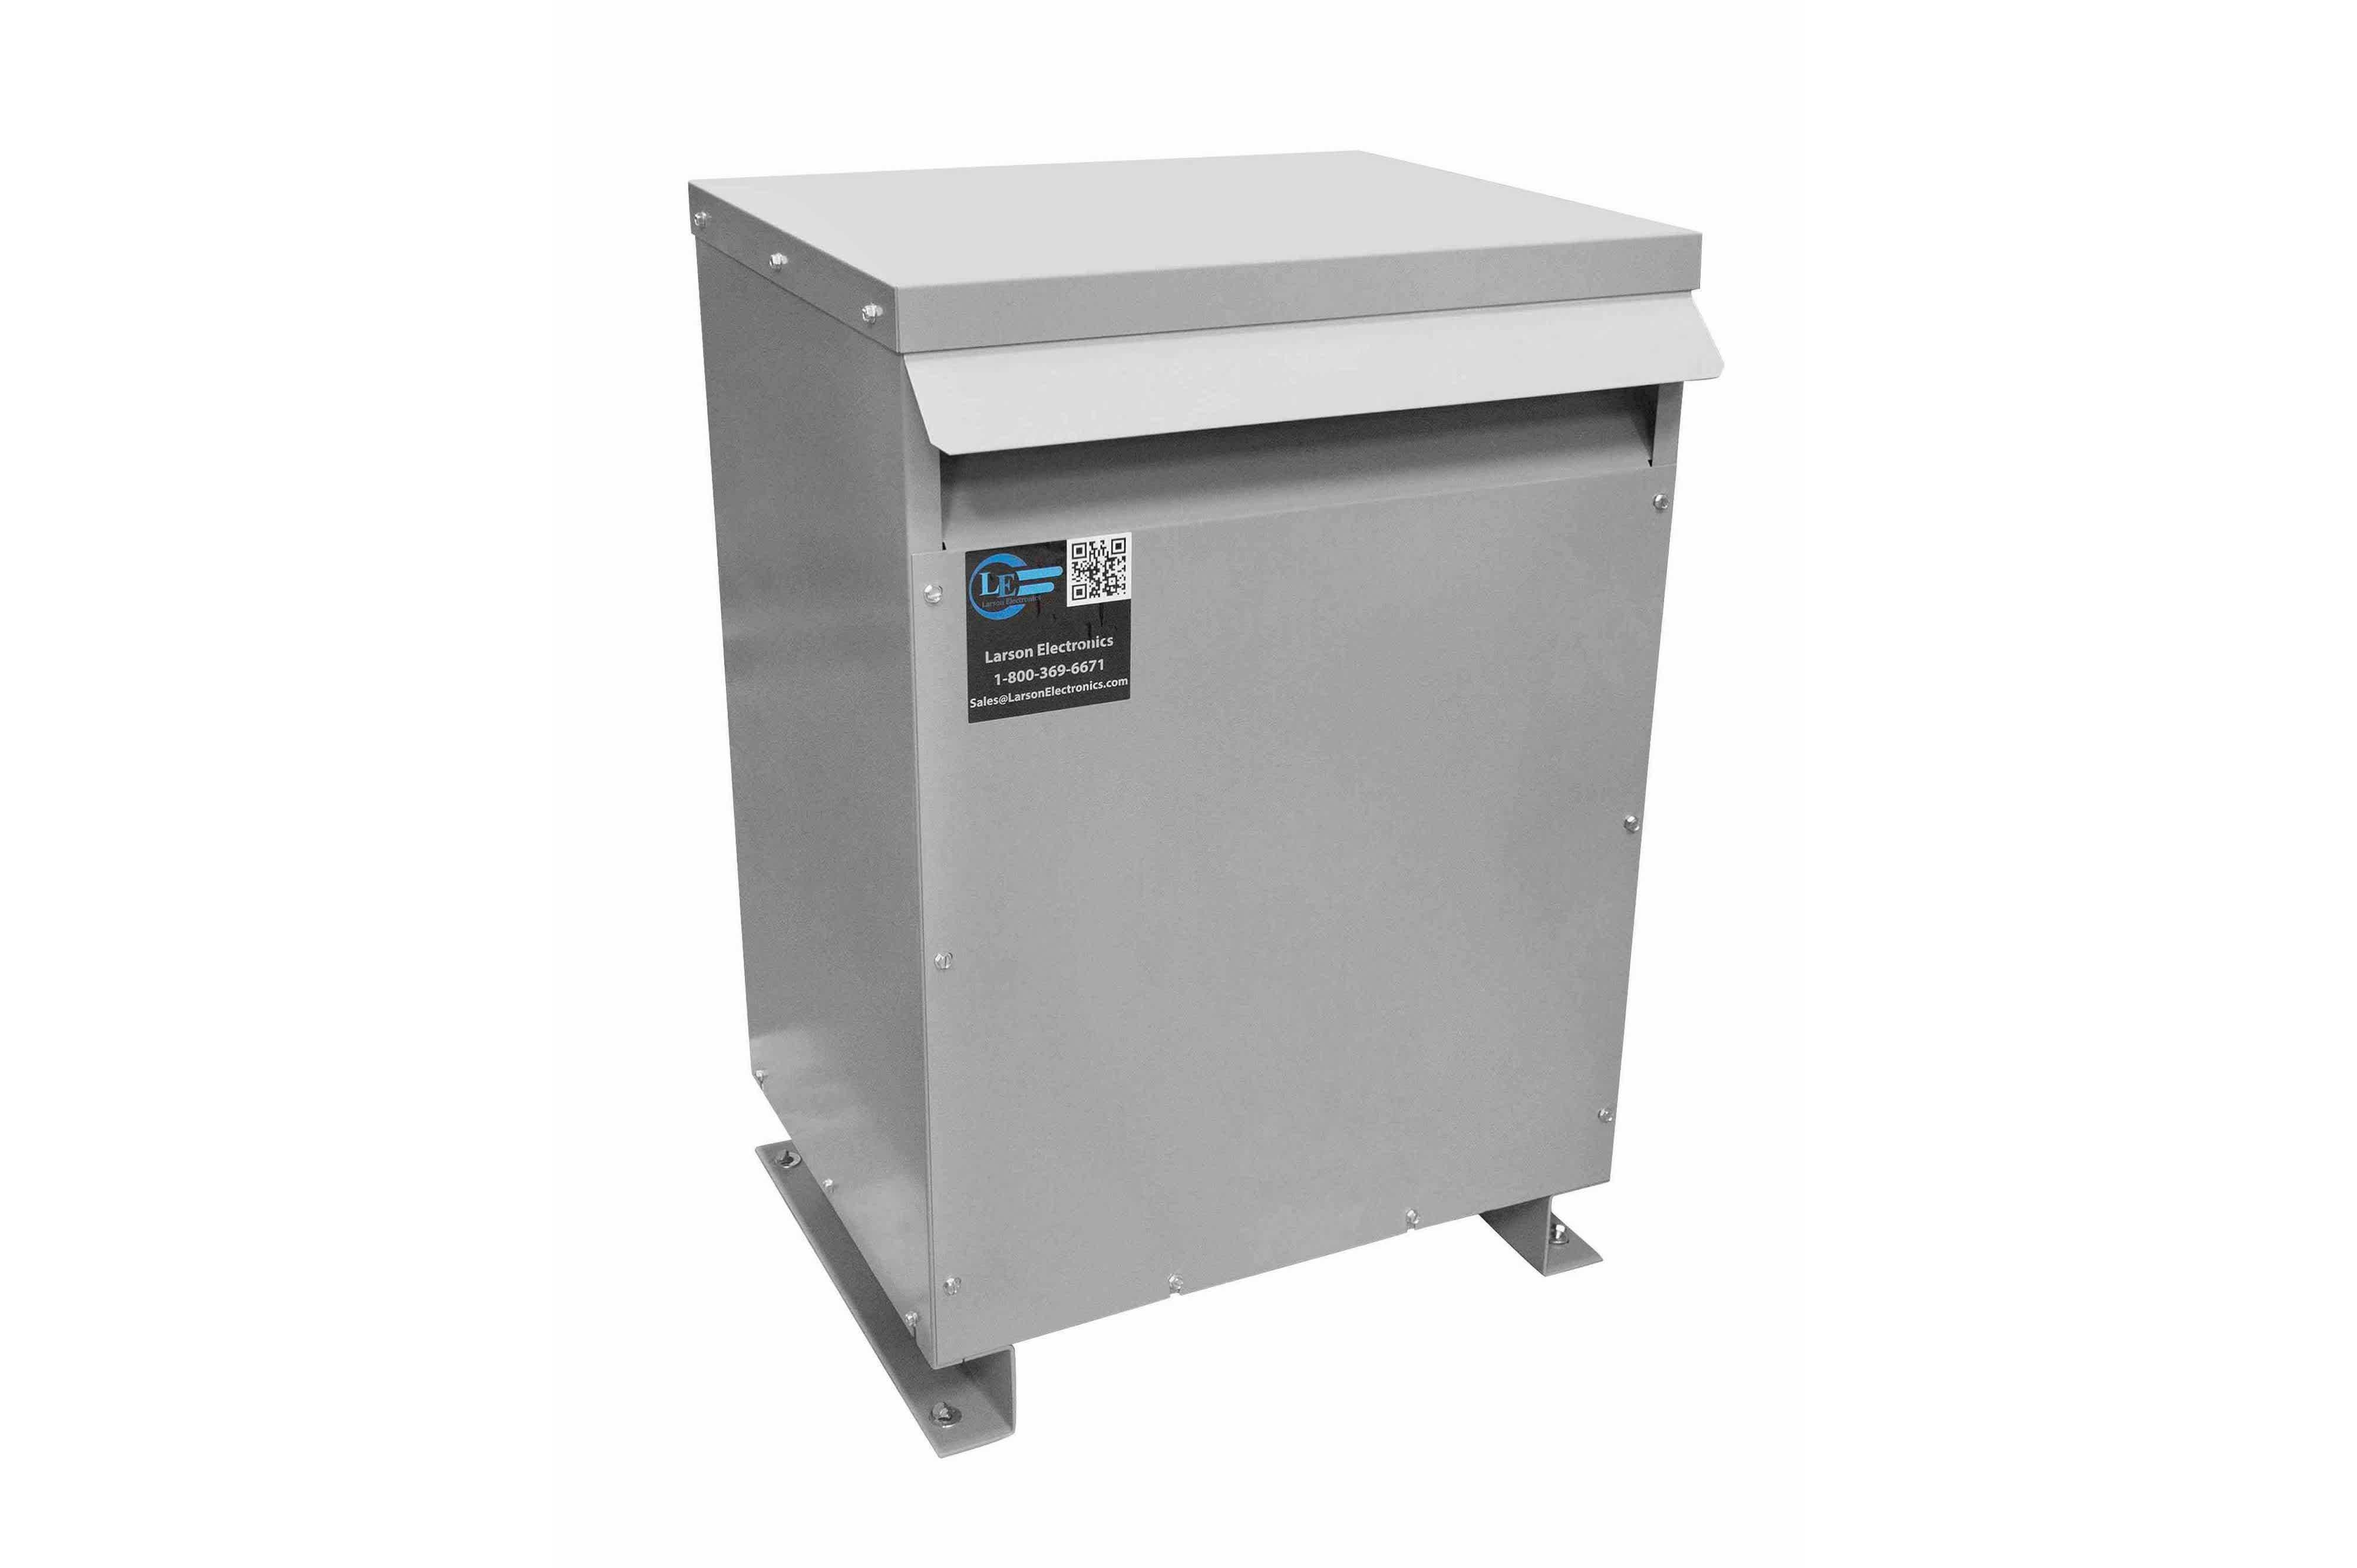 15 kVA 3PH DOE Transformer, 575V Delta Primary, 208Y/120 Wye-N Secondary, N3R, Ventilated, 60 Hz